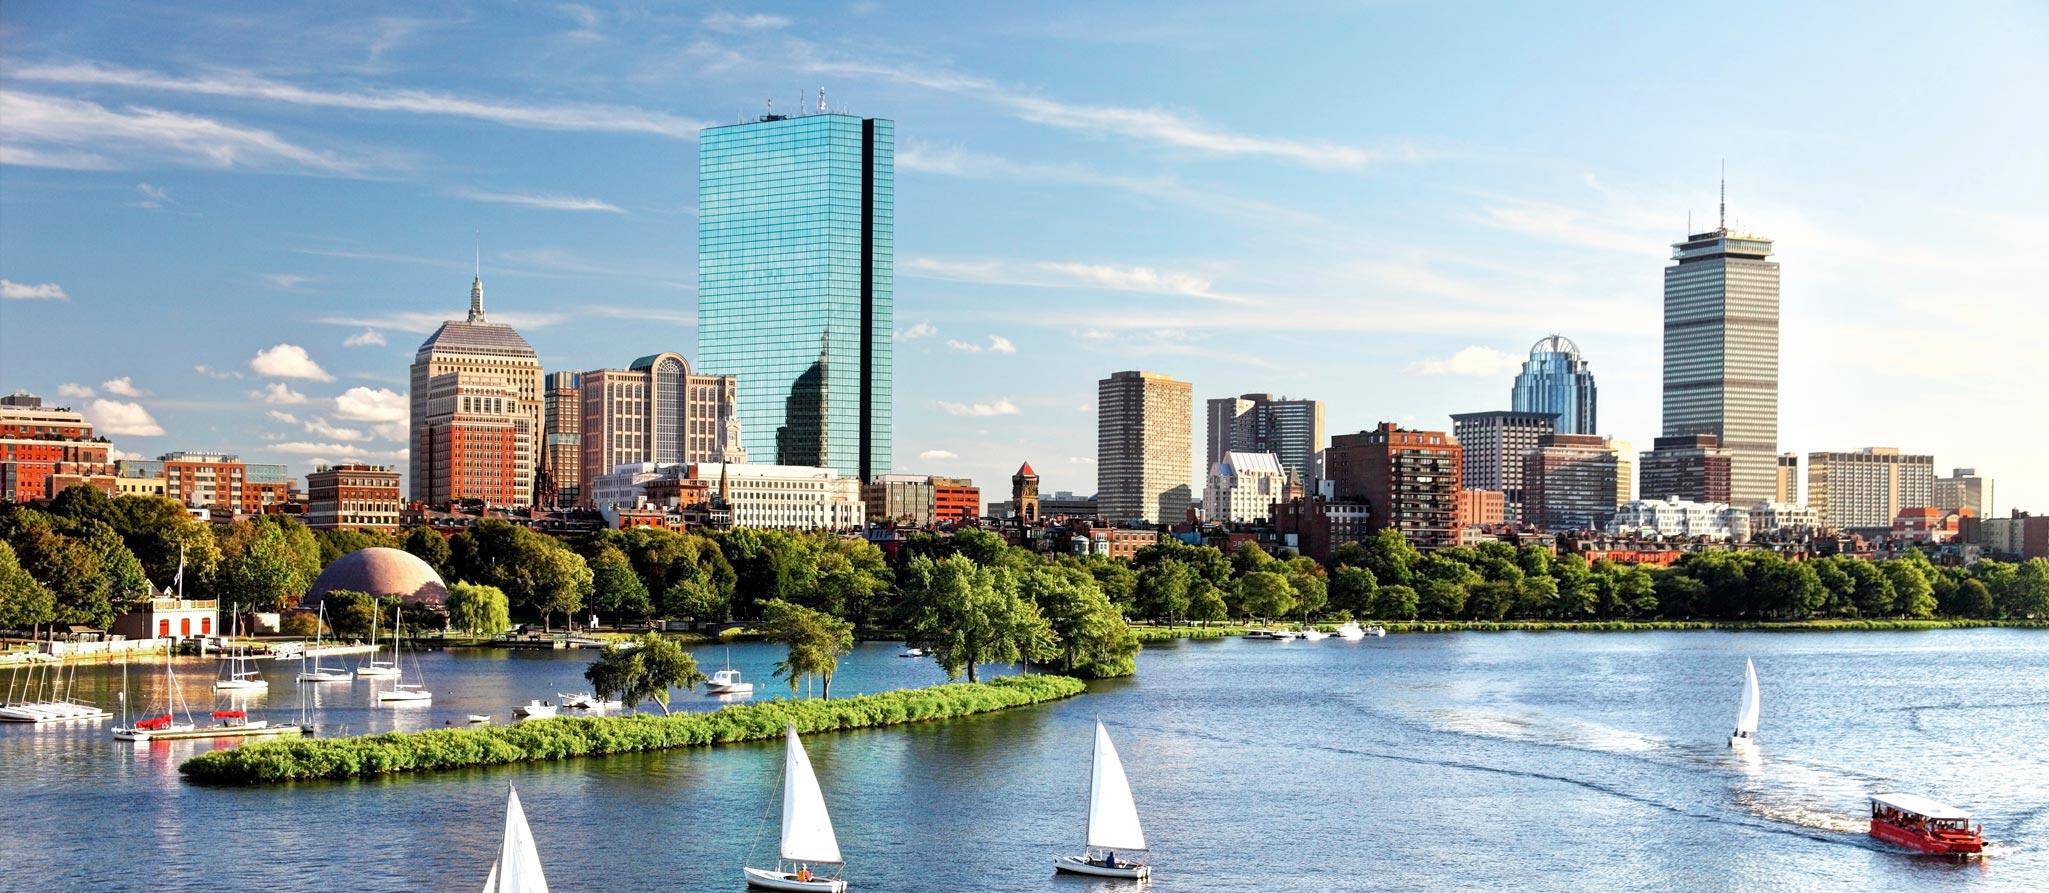 boston-adult-89c4.jpg